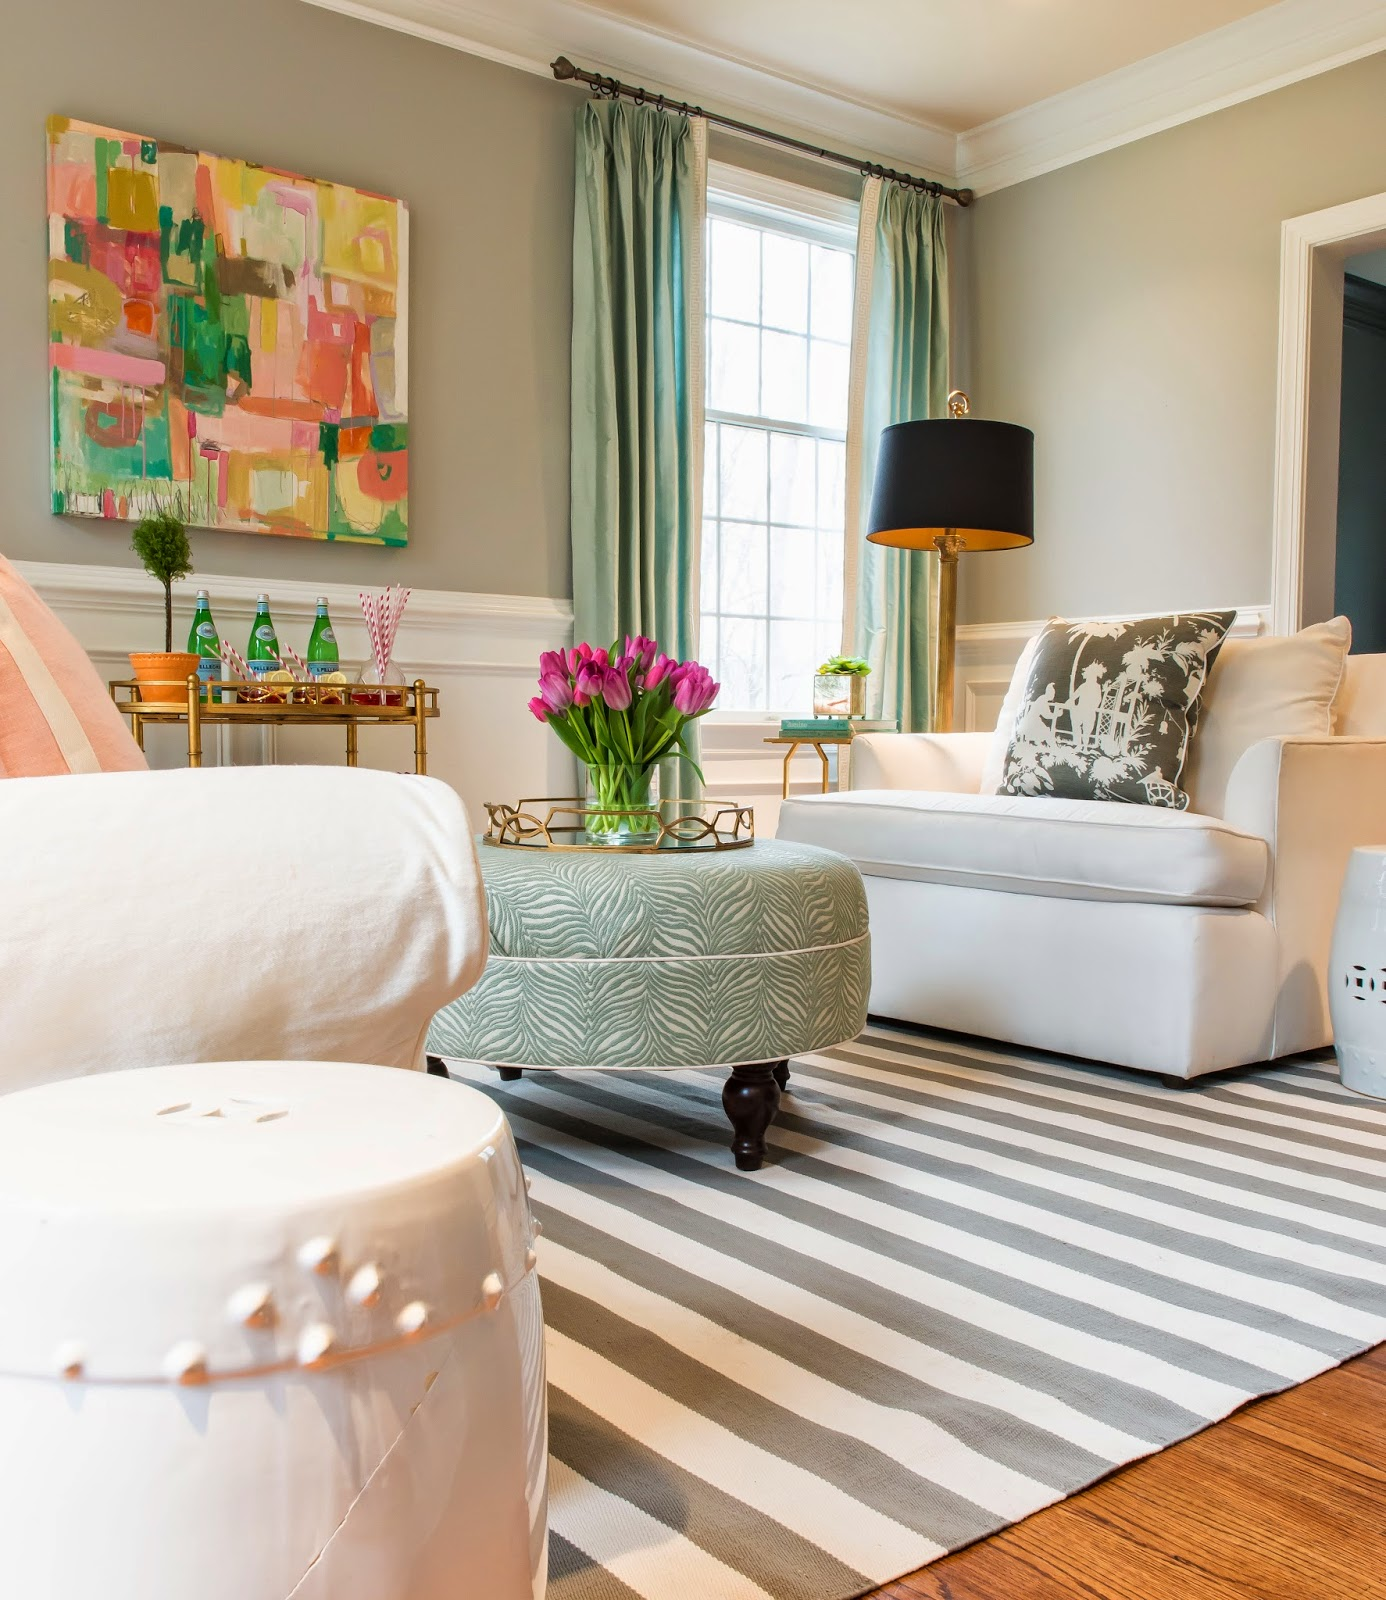 Living Room Designs 2014: Stephanie Kraus Designs: My Living Room ... Ready For Spring